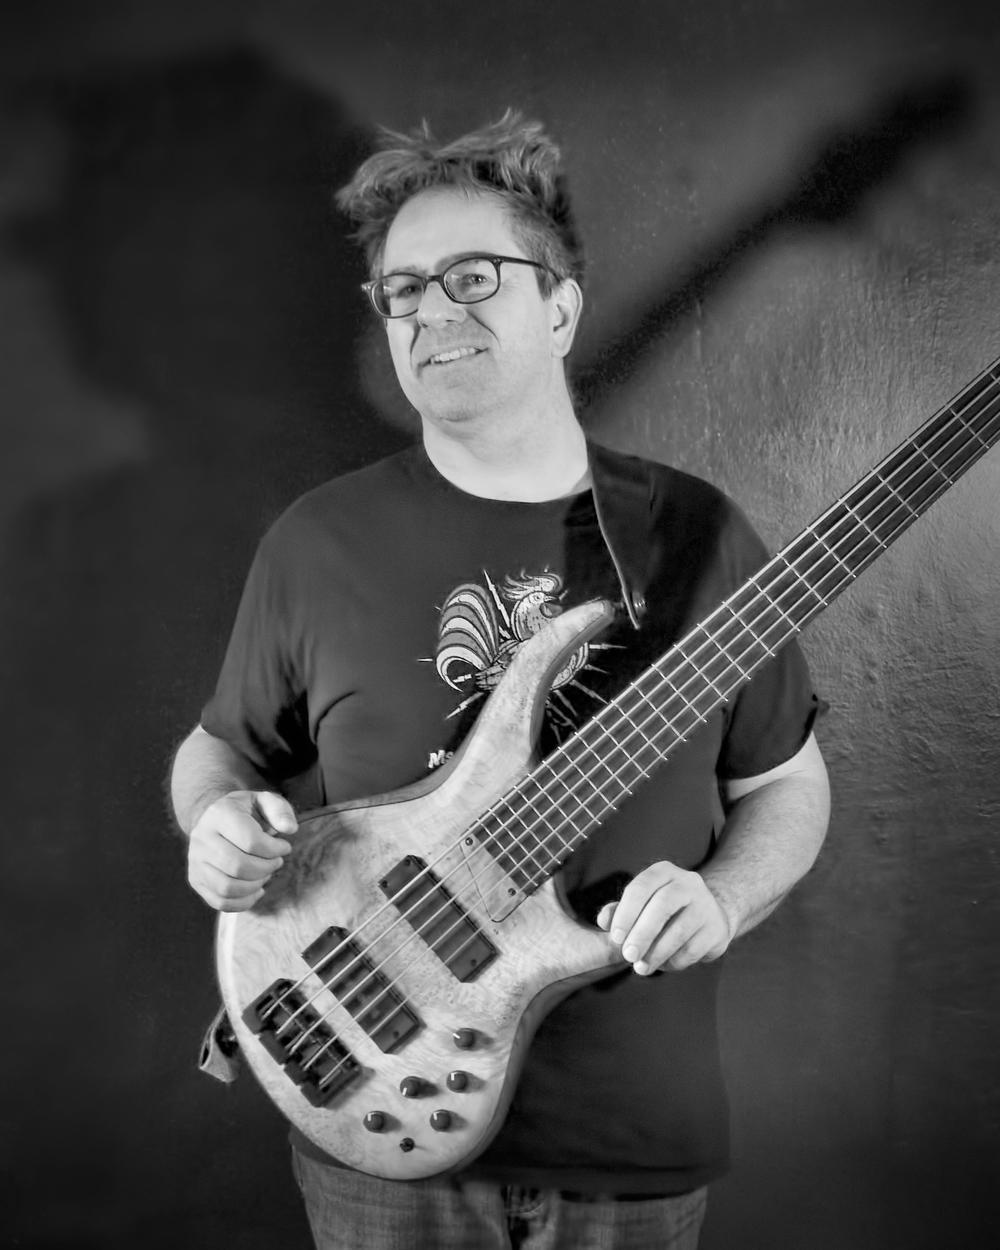 bass-promo-pic-1.jpg